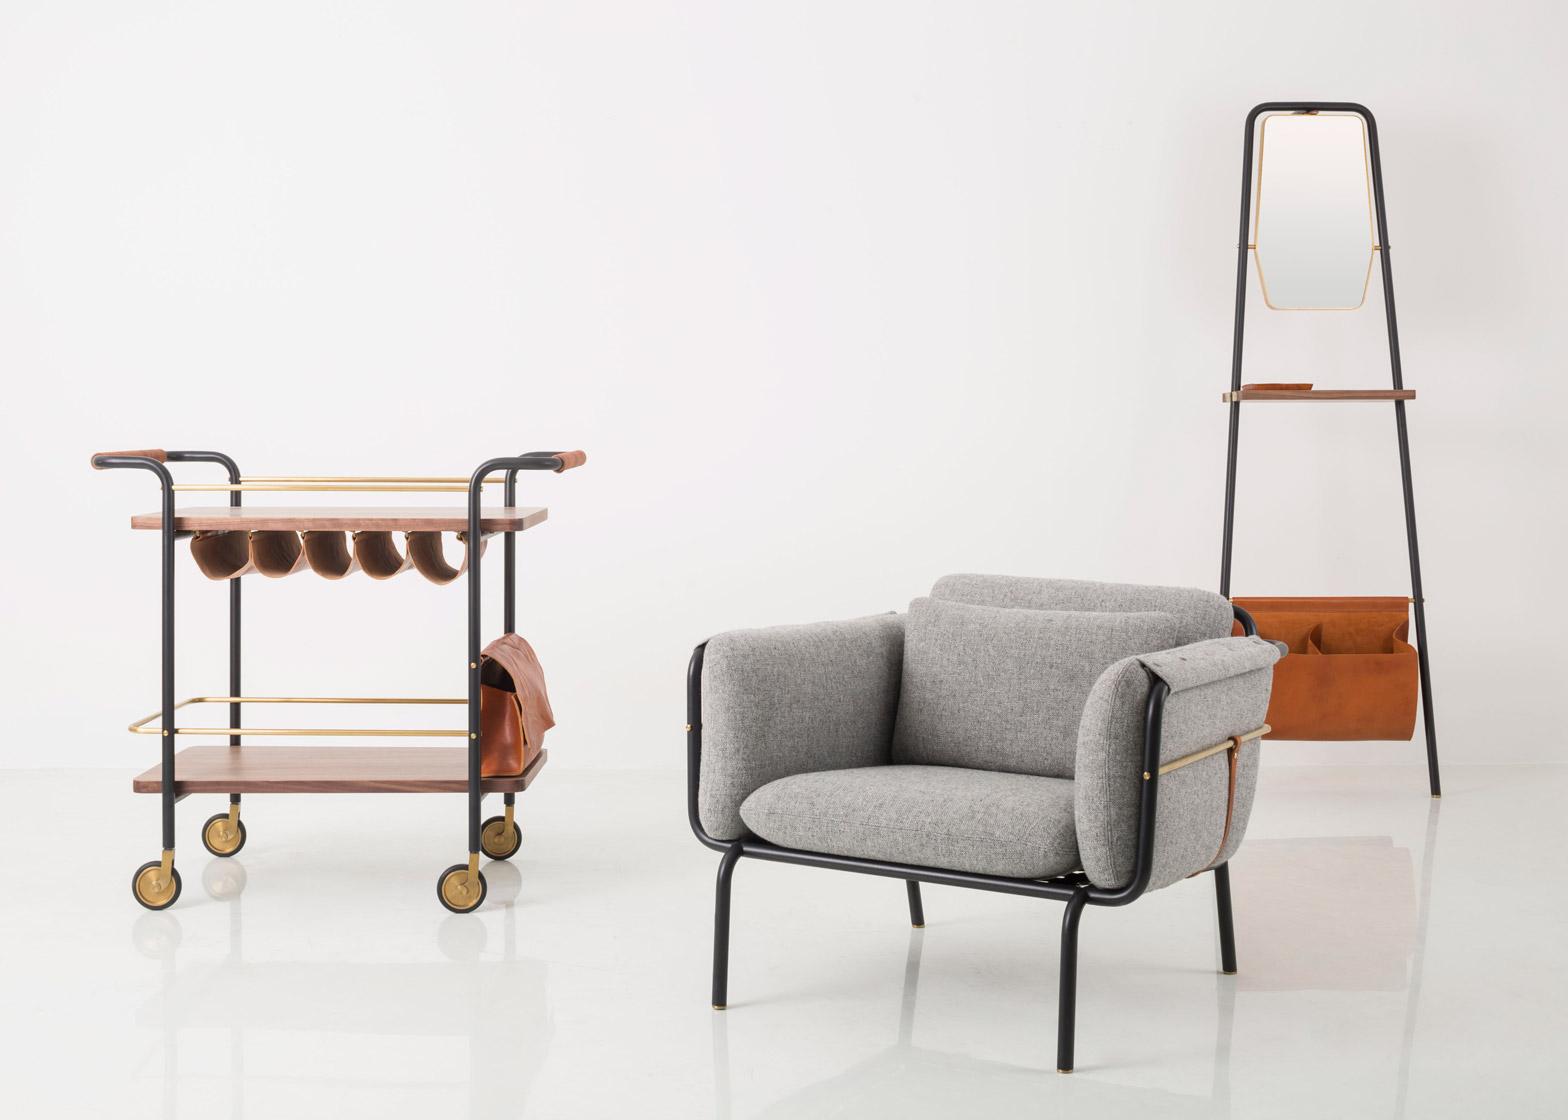 Milan Design Week 2016 Furniture and Decor Preview